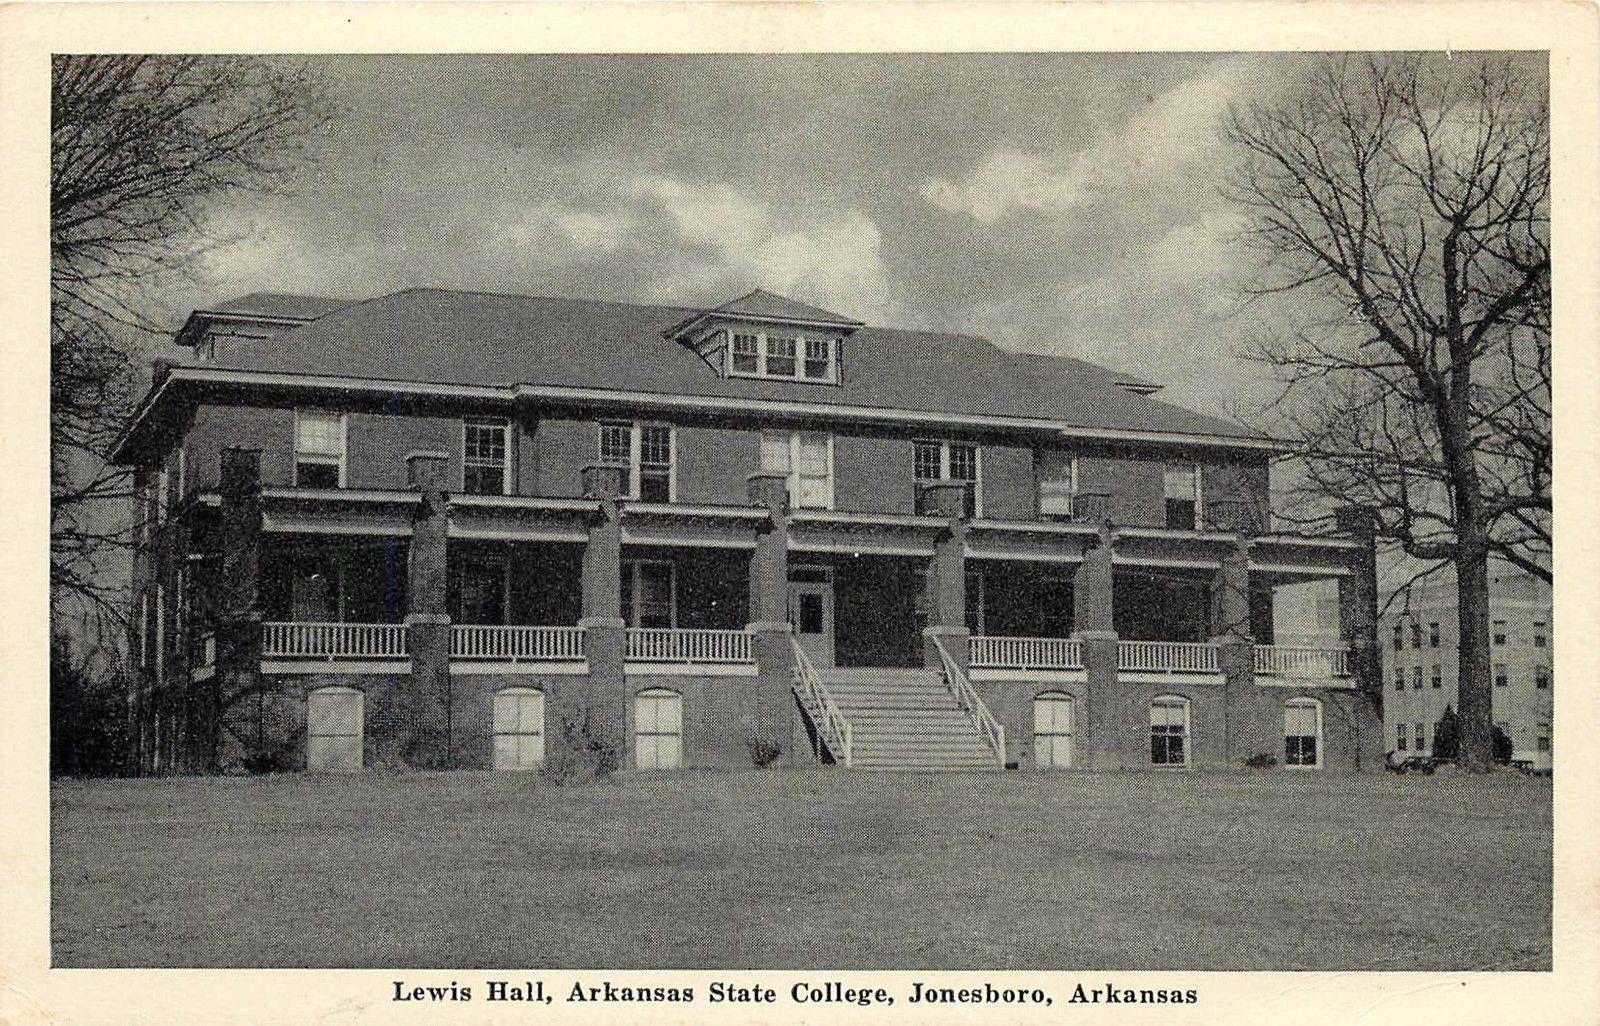 Lewis Hall at Arkansas College in Jonesboro, Arkansas